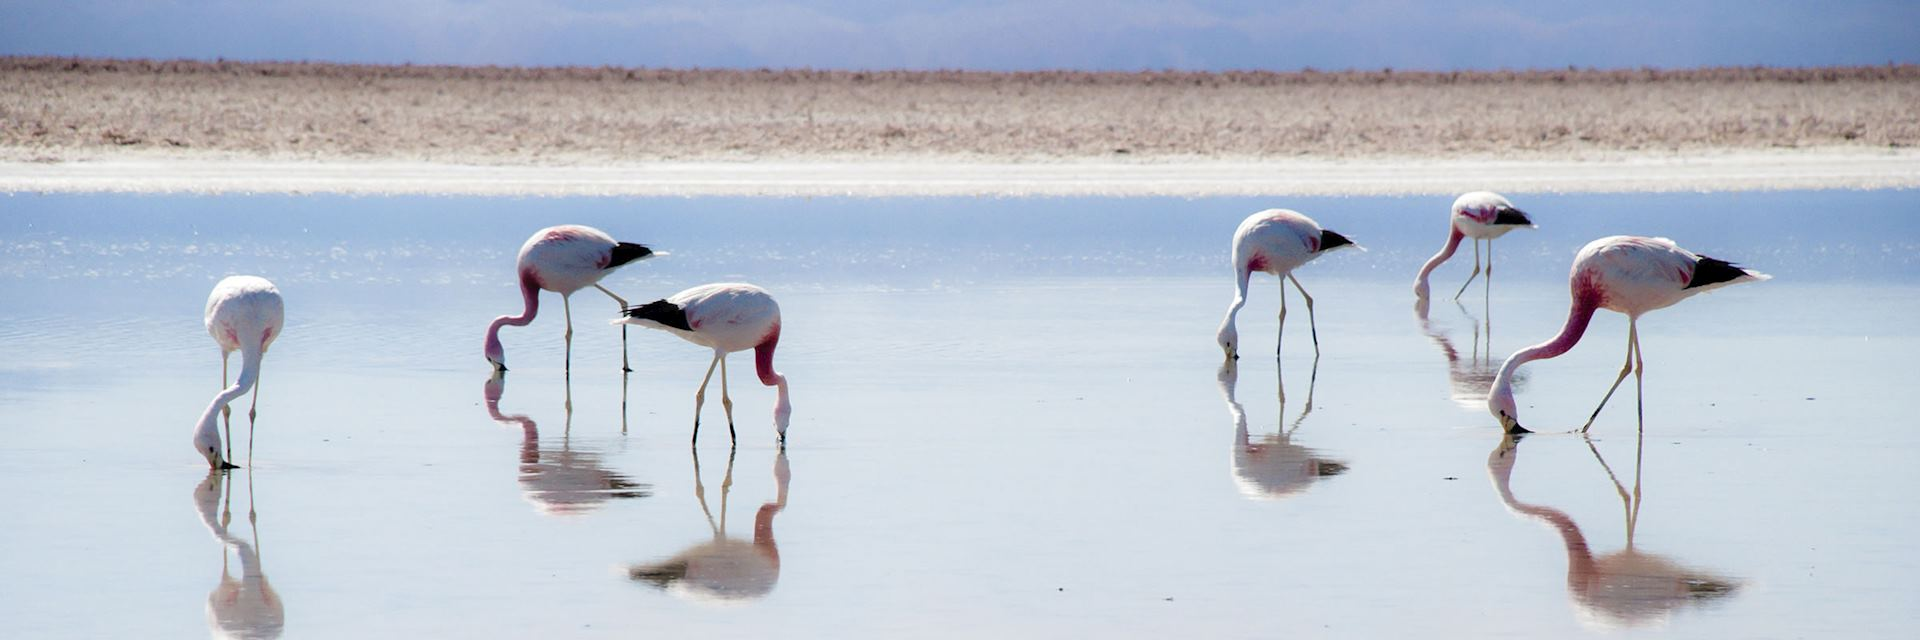 Flamingo on the Salar de Atacama slat flat